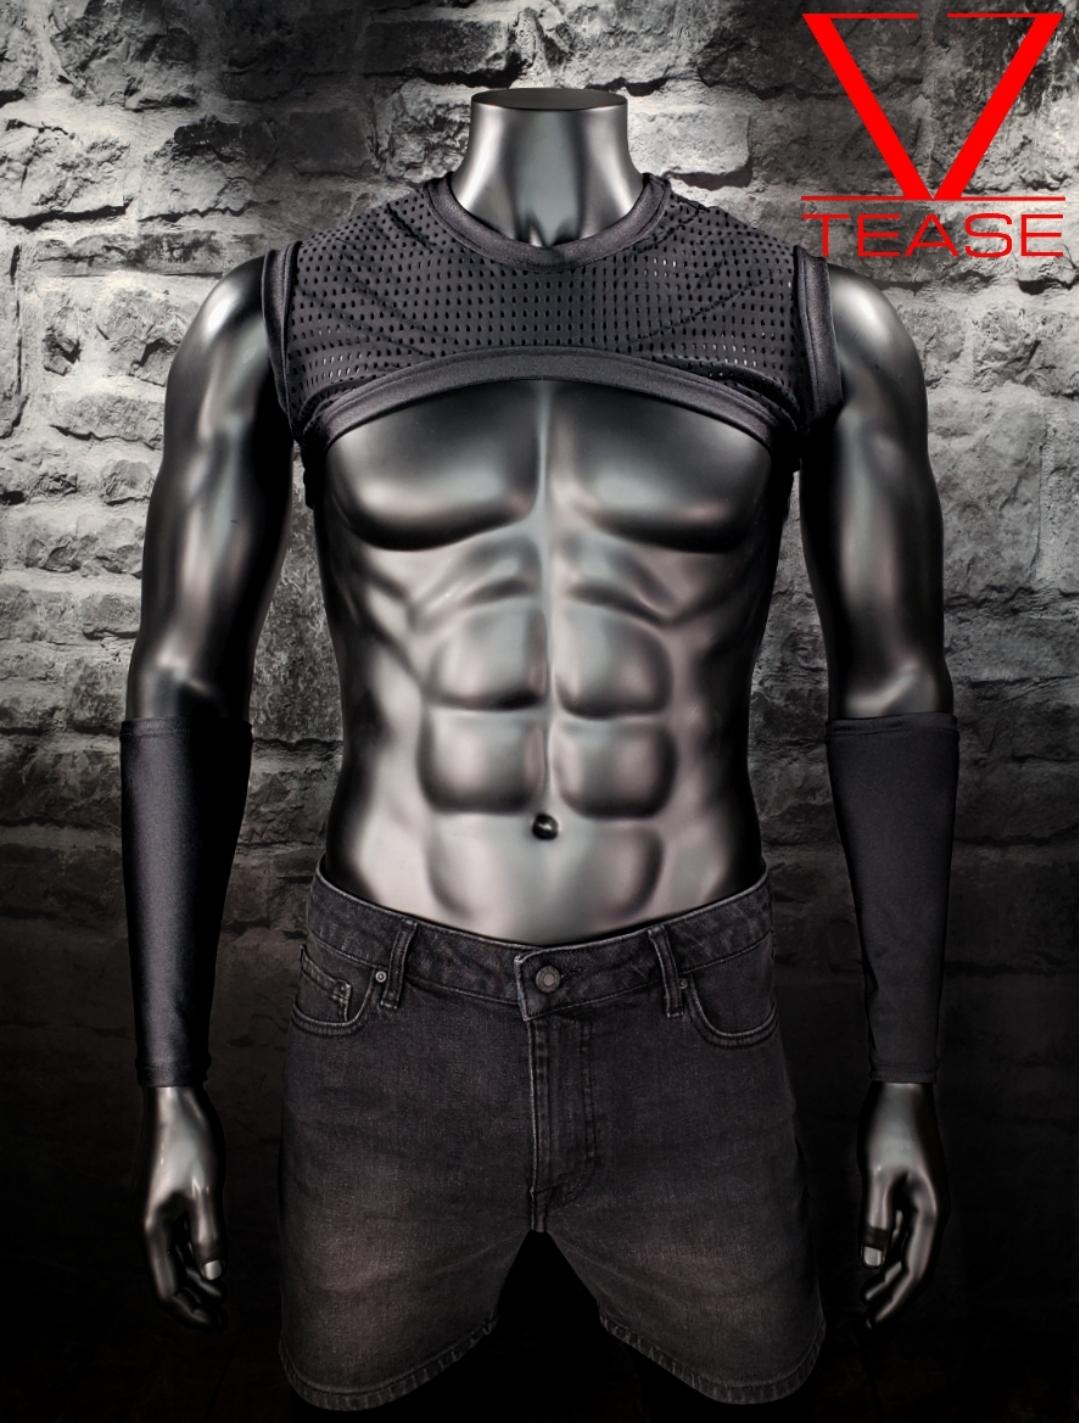 Black Athletic Sleeveless Men's Crop Top